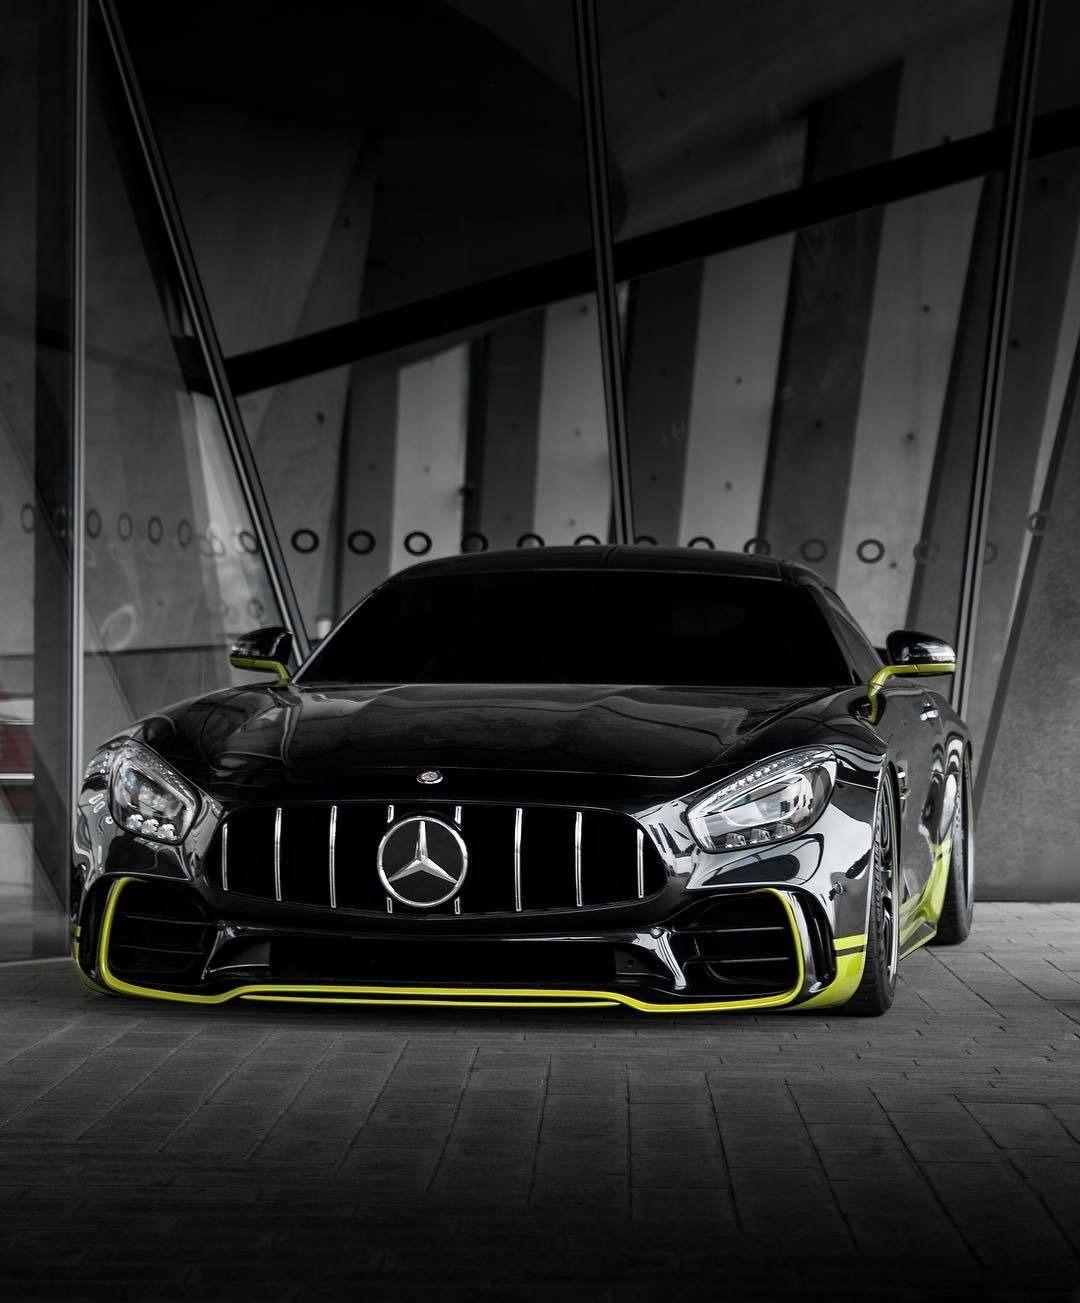 Mercedesbenz Luxury Cars Otomocars Cars Mercedescars Mercedes Amg Mercedes Car Mercedes